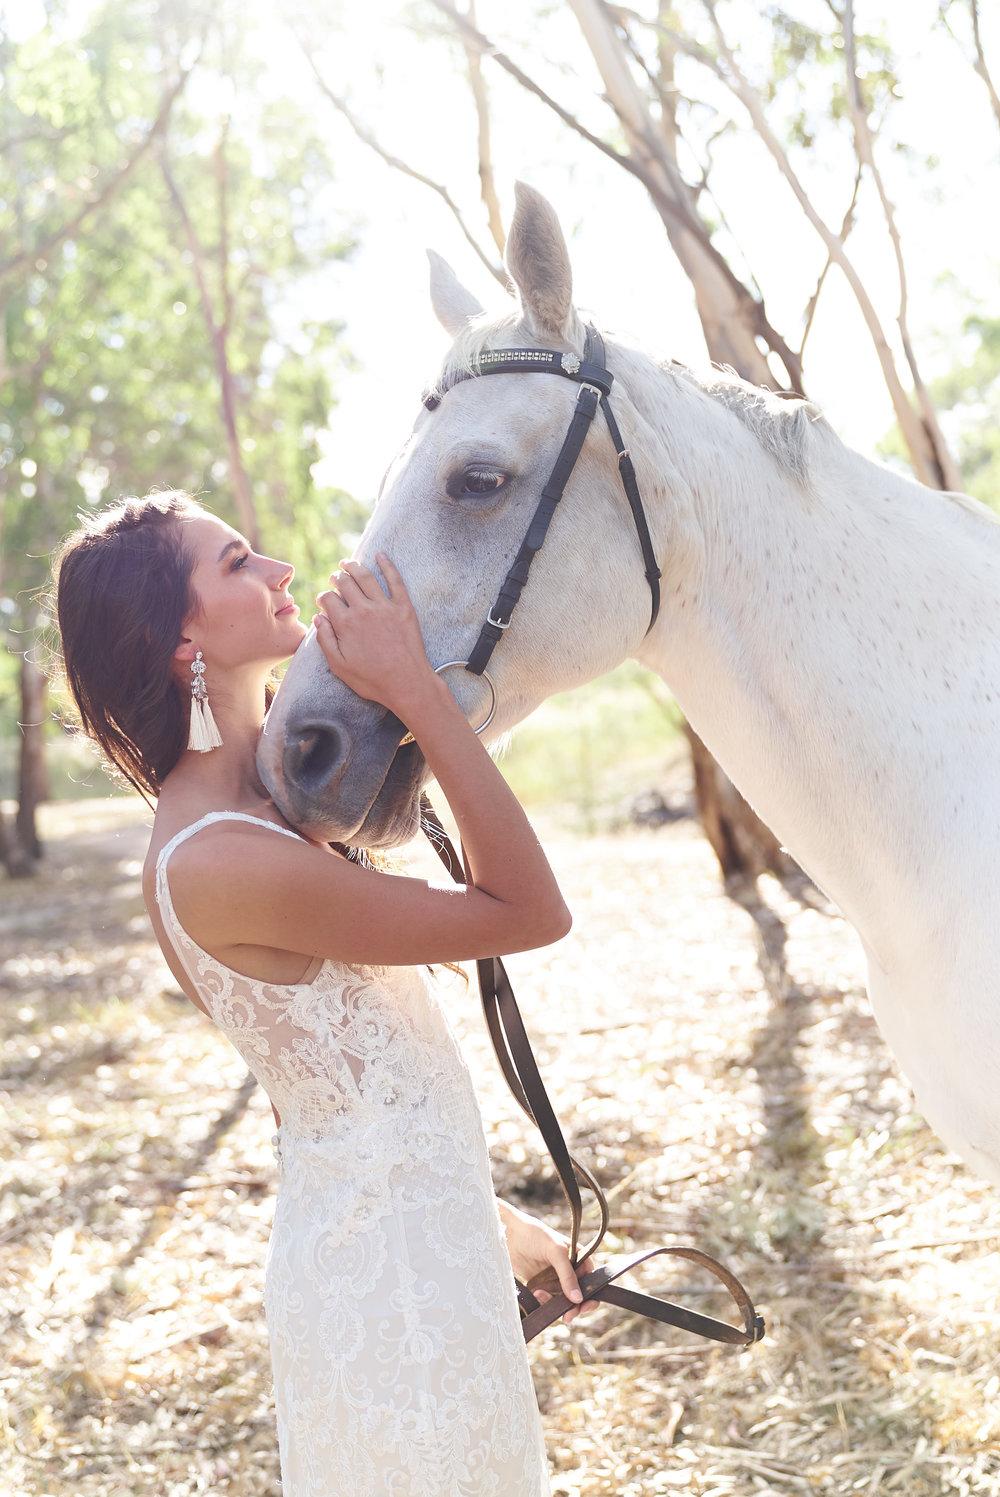 Anna Campbell Bridal | Harlow Dress | Modern Lace Wedding Dress